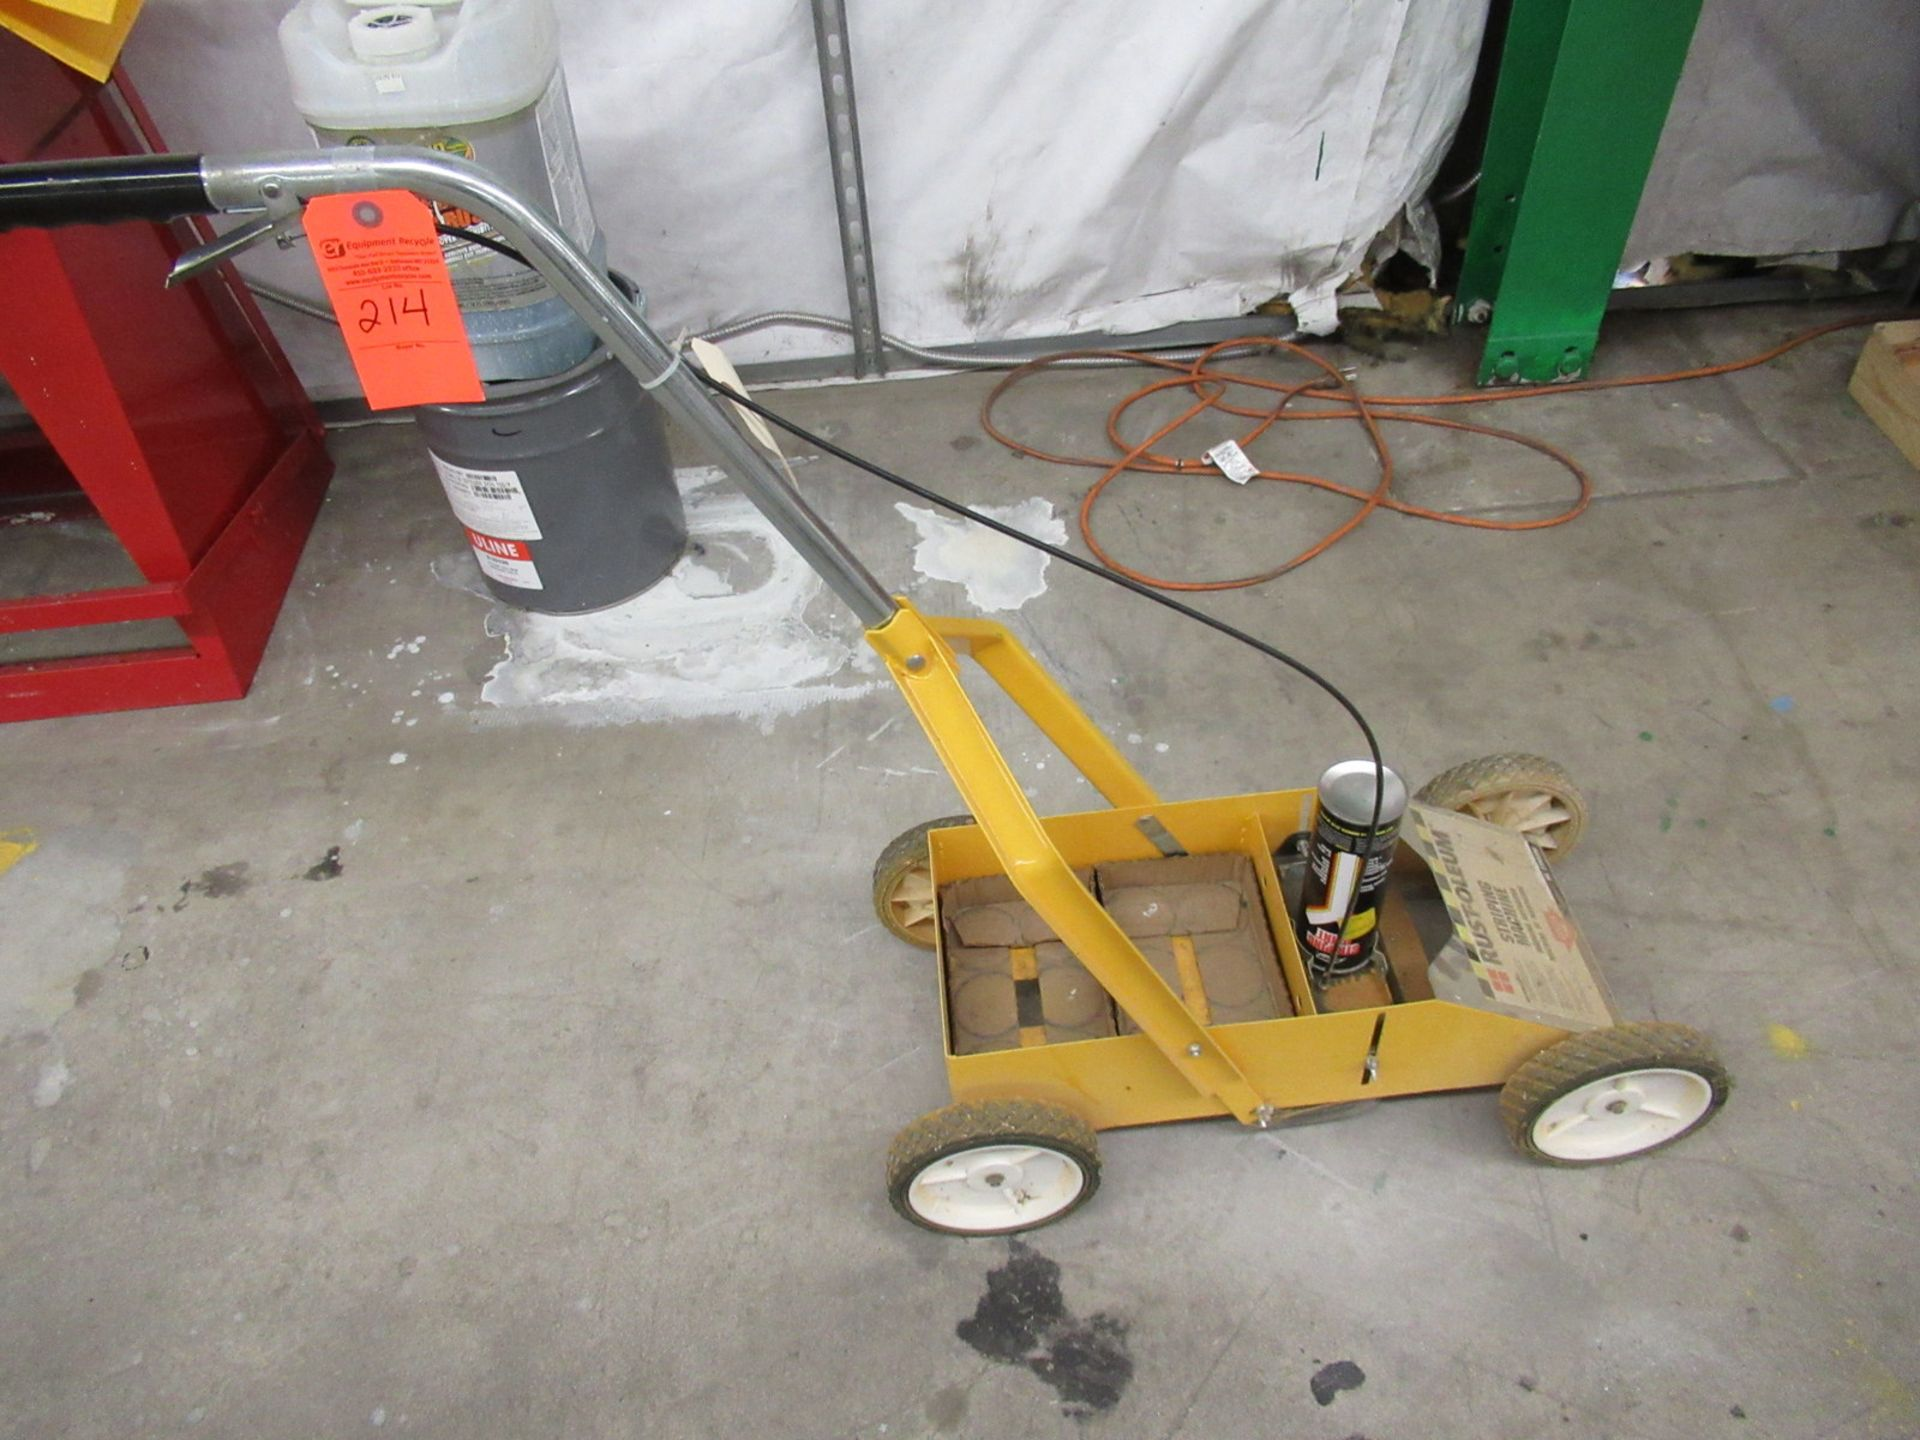 Lot 214 - Rustoleum 2395000 Striping Machine